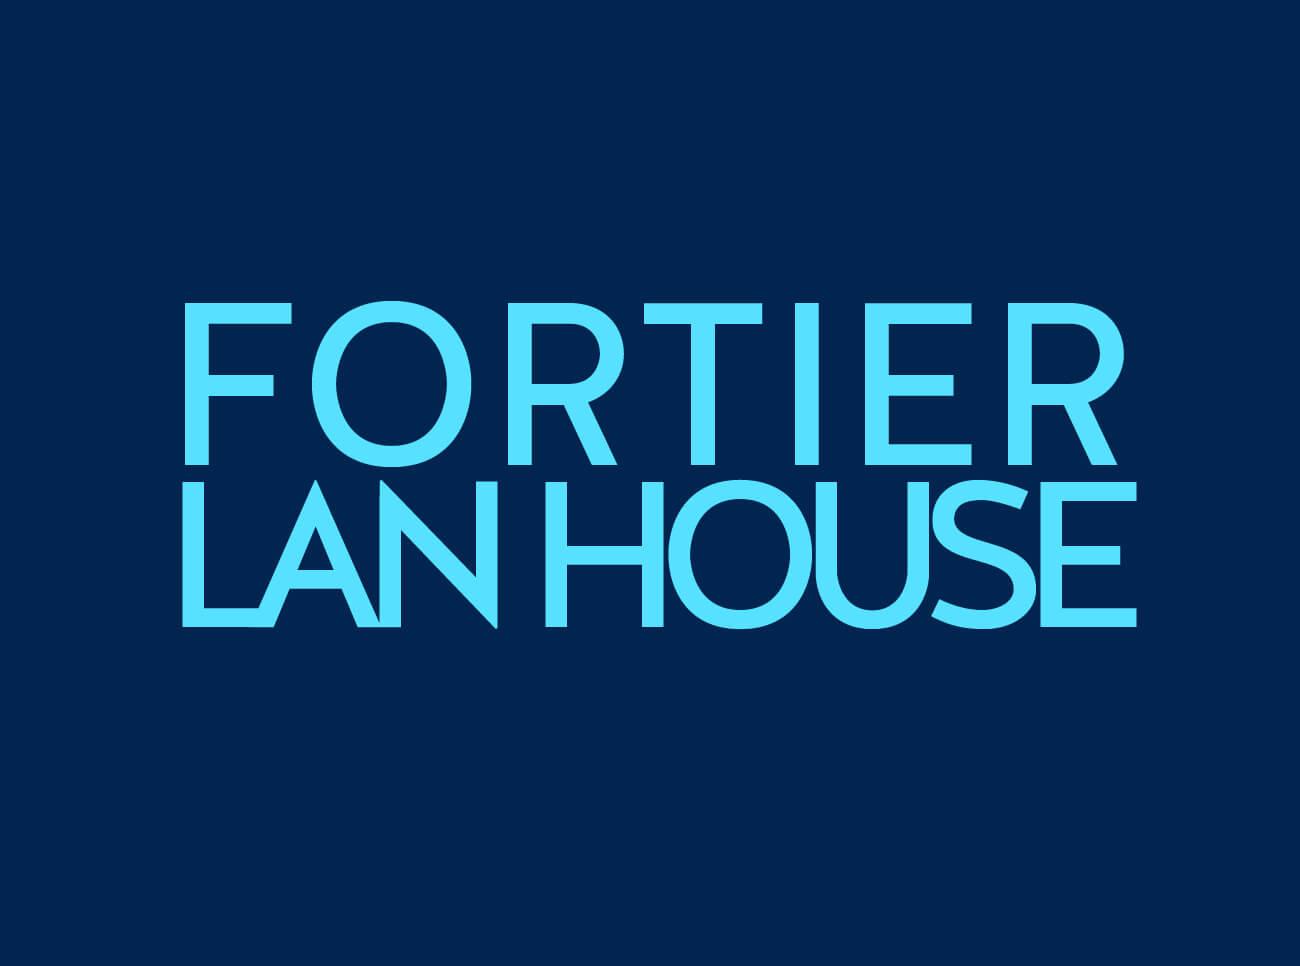 fortier-lanhouse